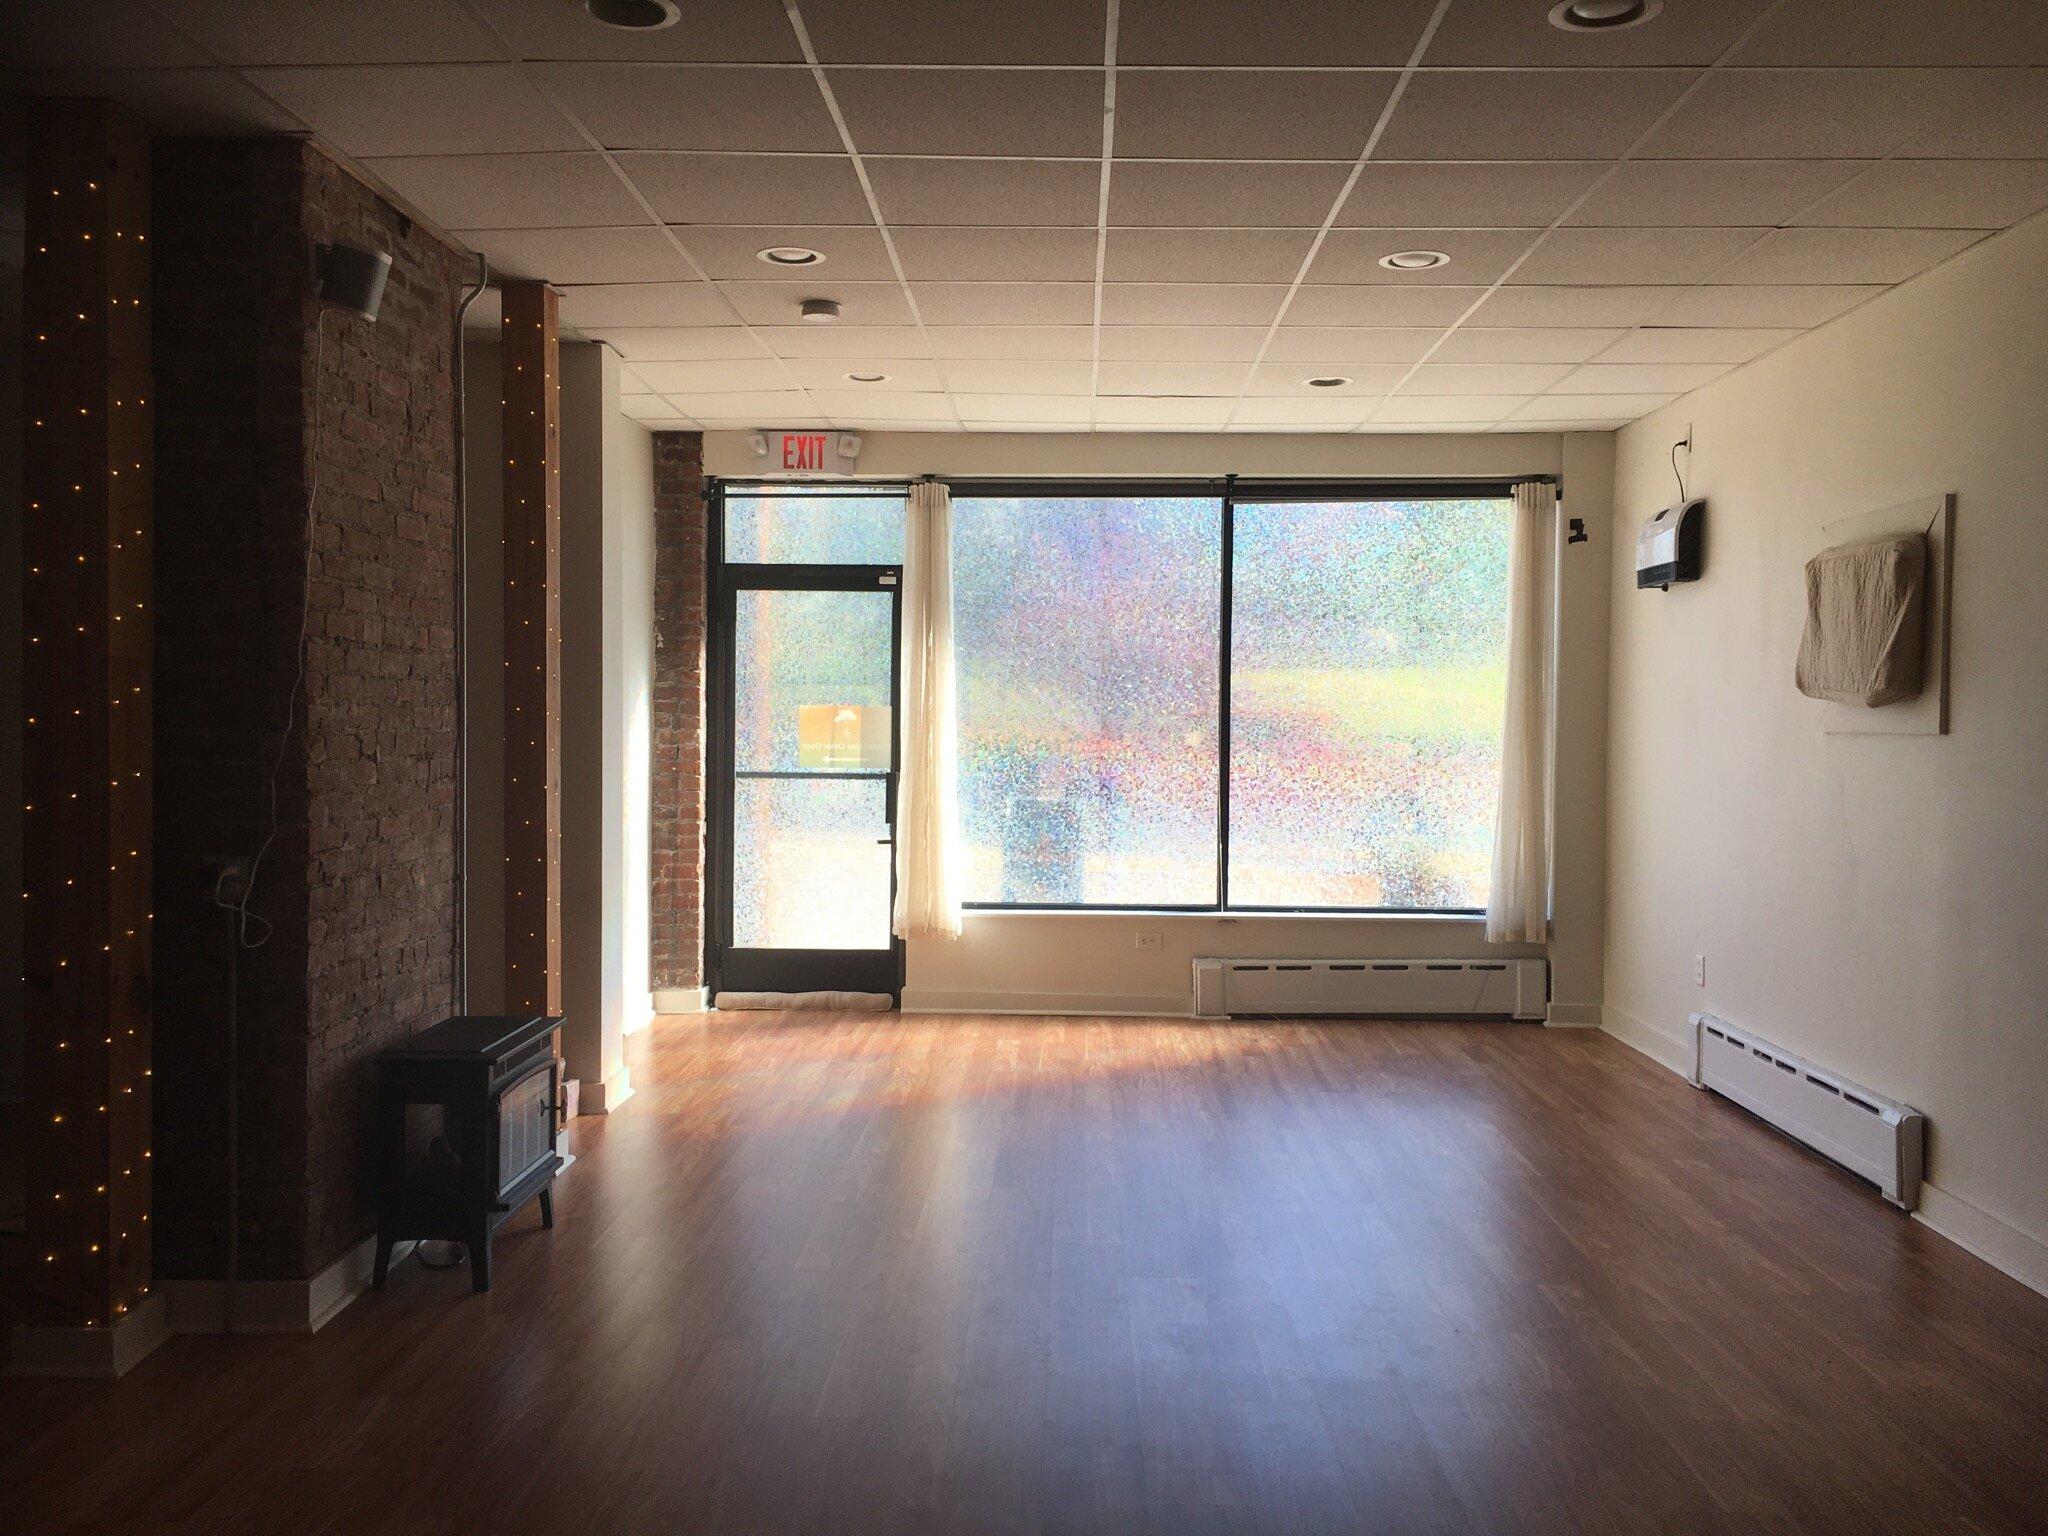 Studio windows